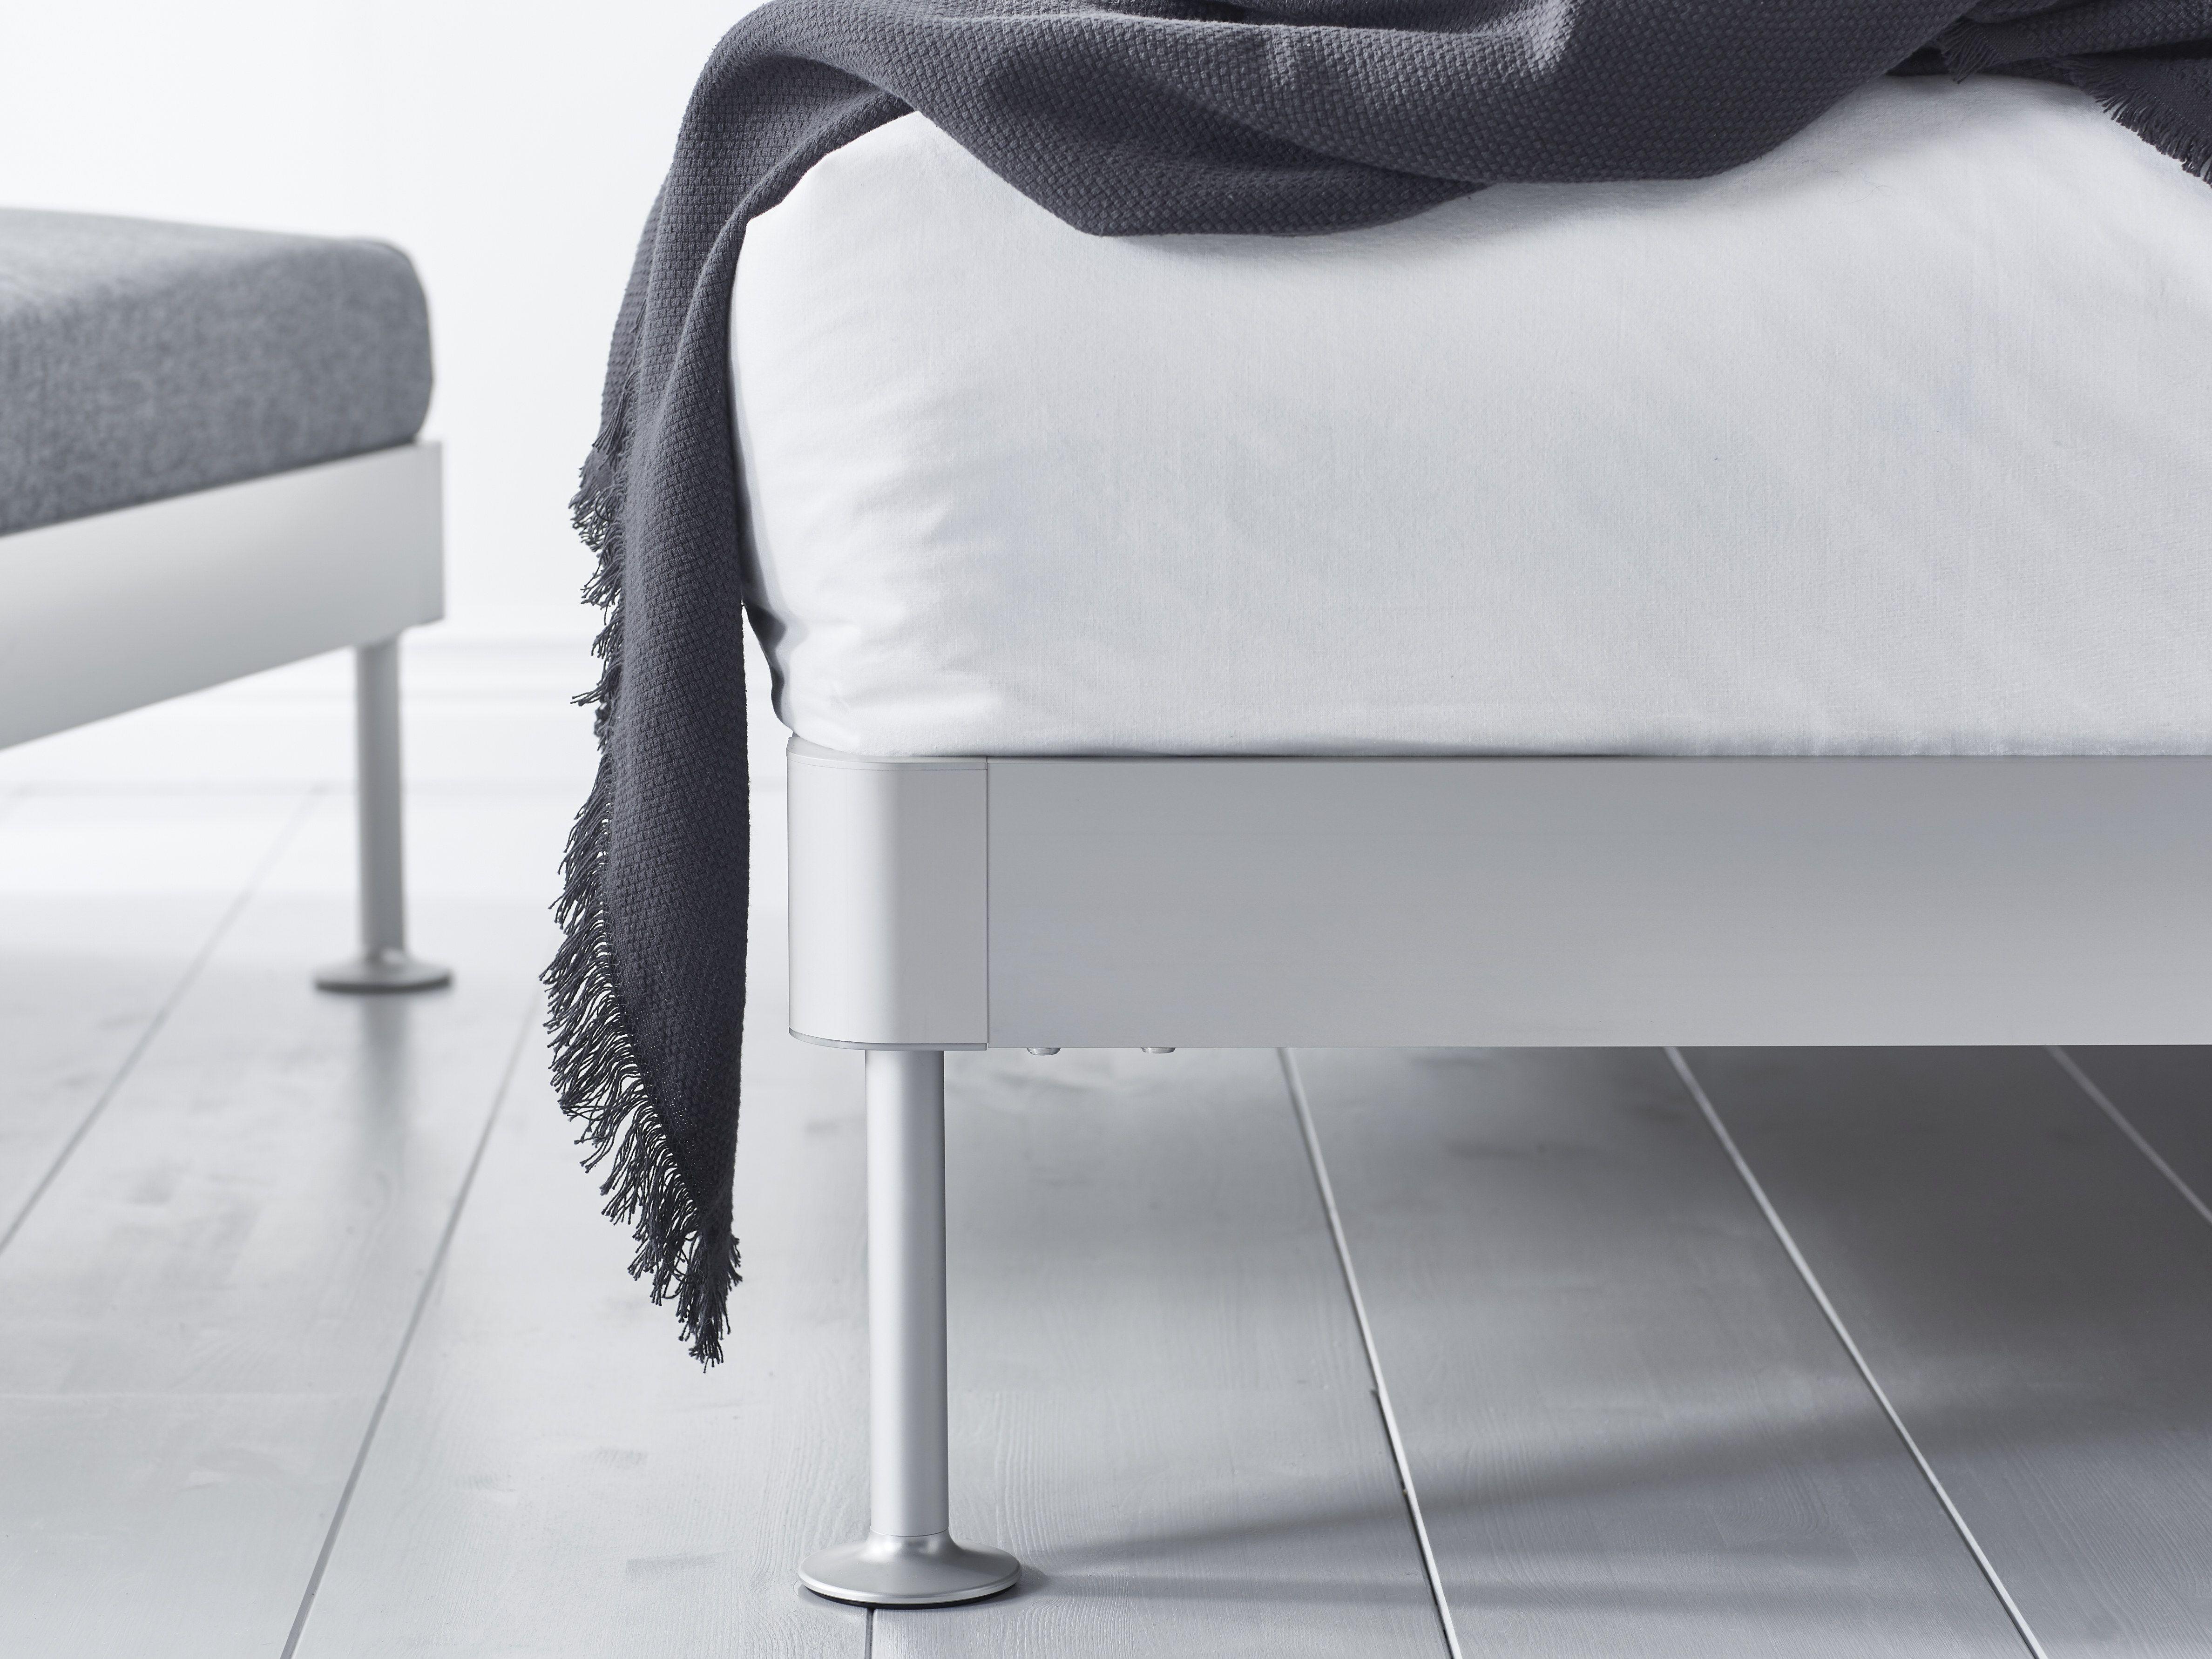 Ikea X Tom Dixon S New Delaktig Bed Frame And Headboards For 2019 Bed Frame And Headboard Ikea Scandinavian Interior Design Inspiration